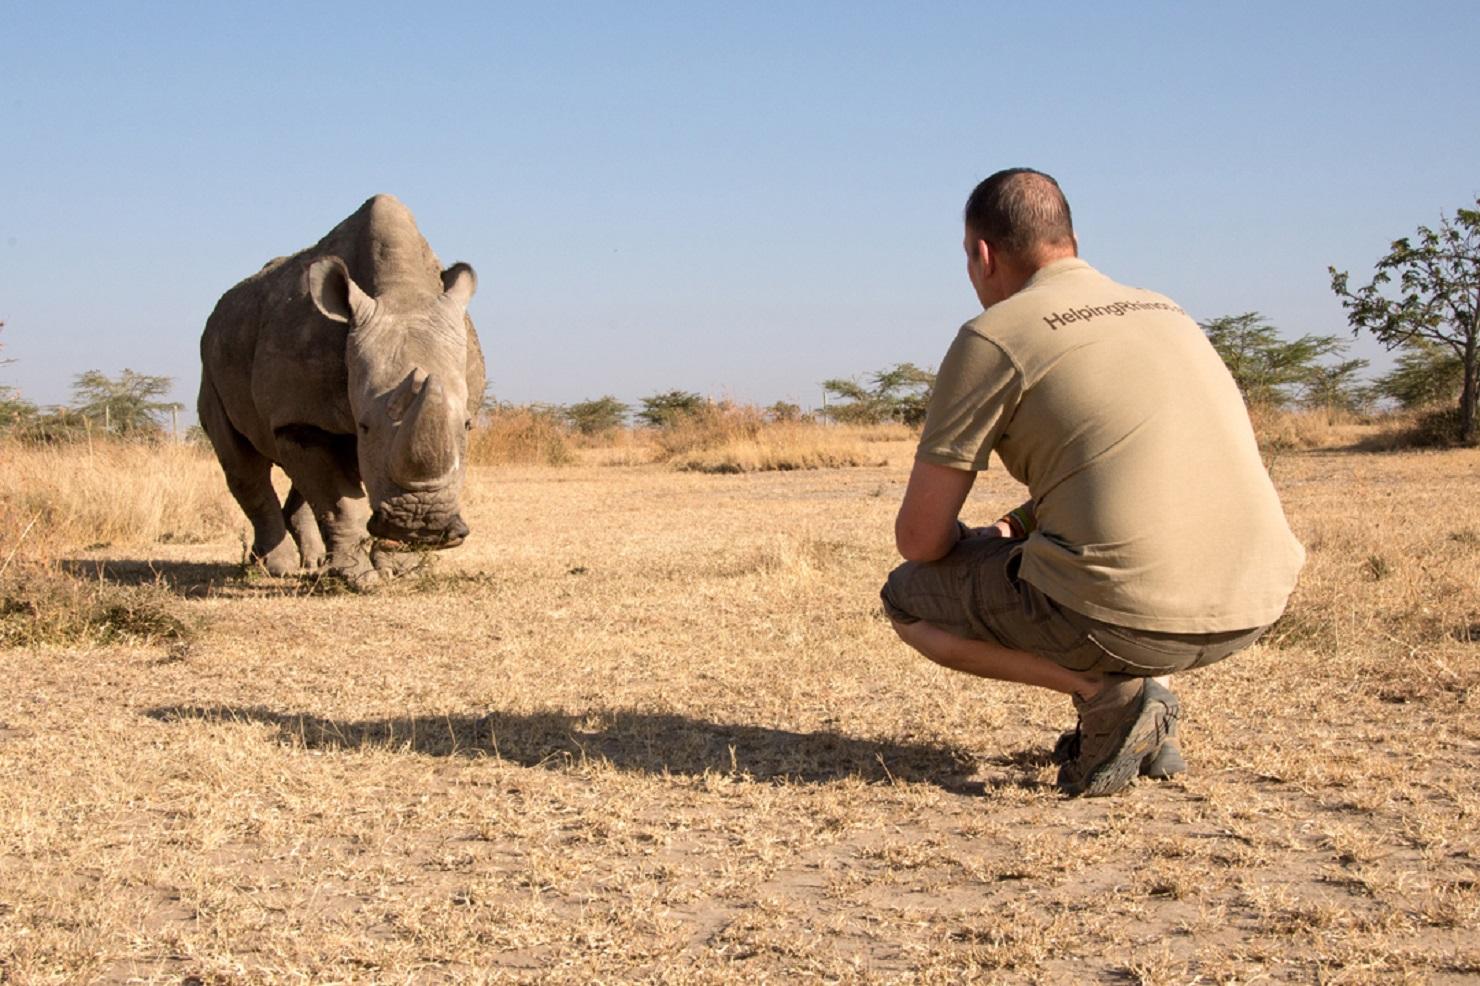 World's last male northern white rhino dies - Sunday Post